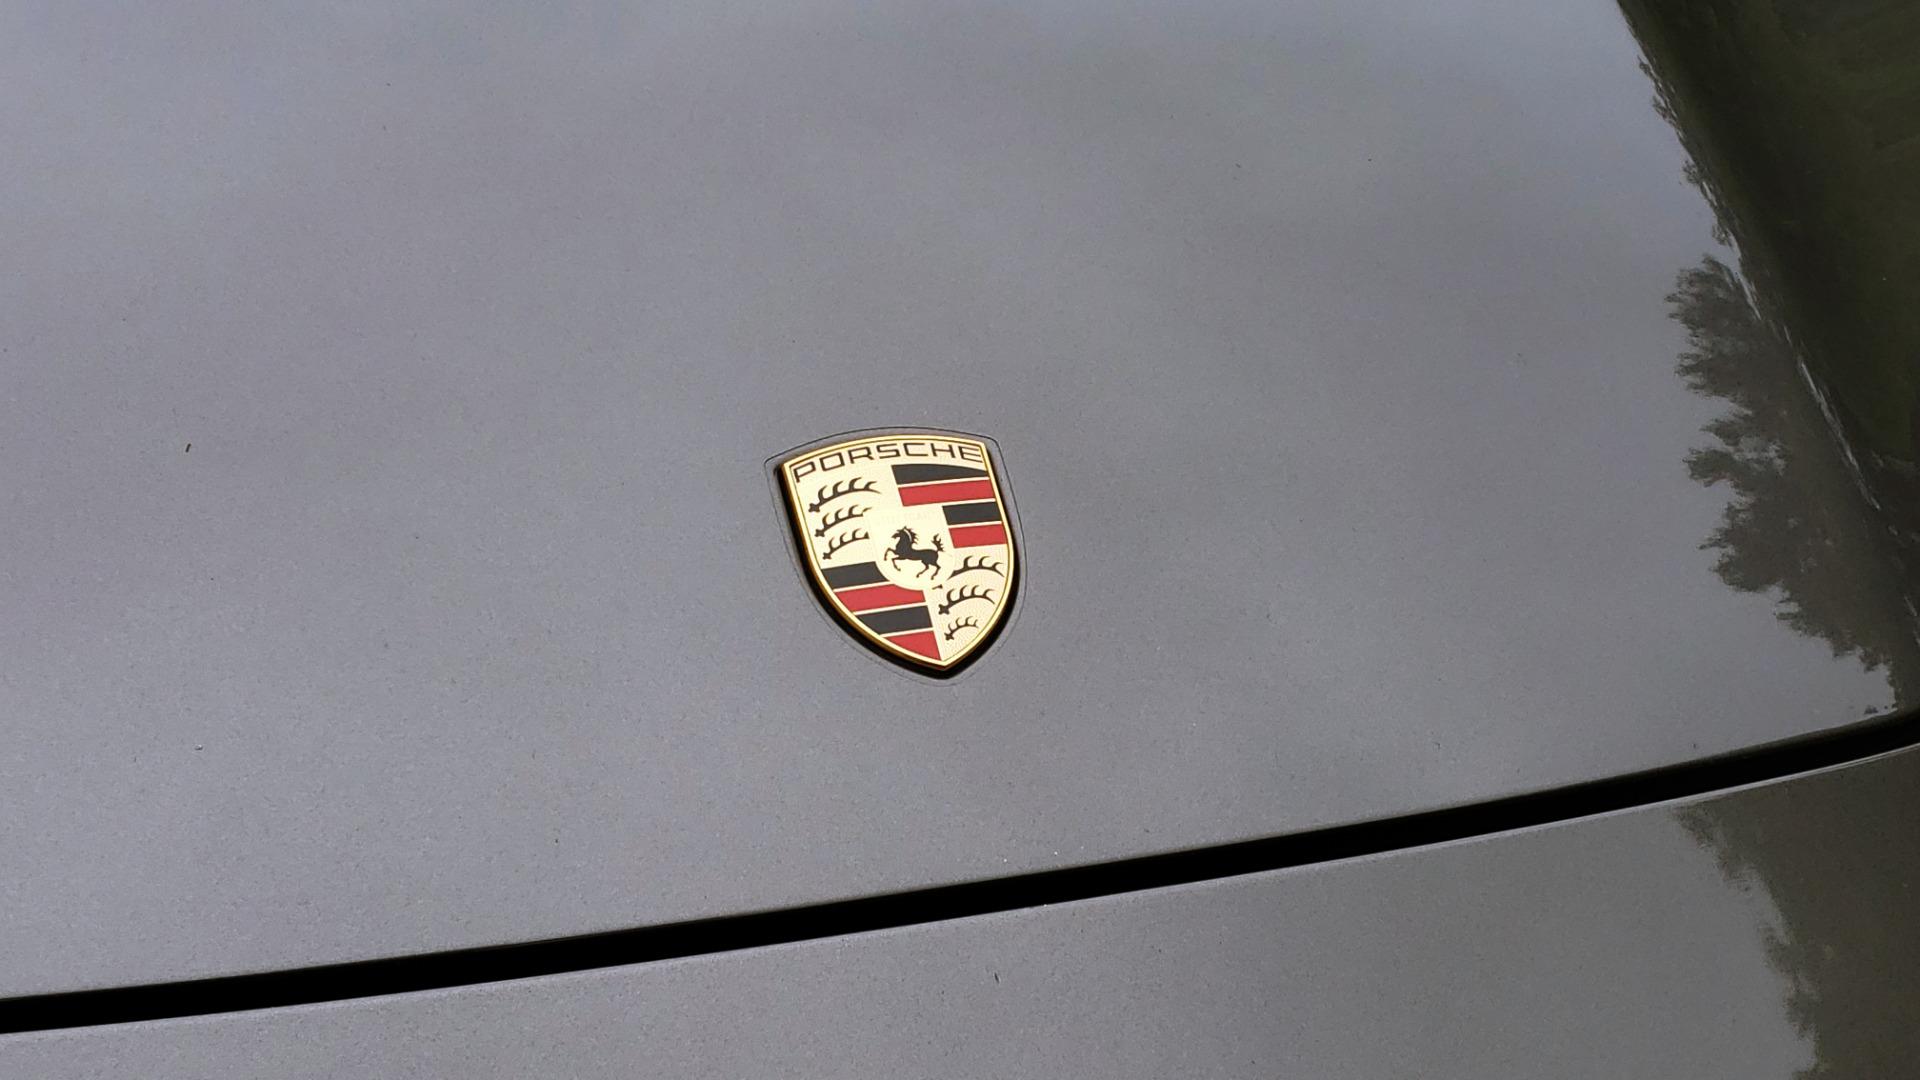 Used 2013 Porsche PANAMERA TURBO 4.8L V8 / AWD / NAV / SUNROOF / LCA / PARK ASST / BURMESTER for sale $45,995 at Formula Imports in Charlotte NC 28227 14